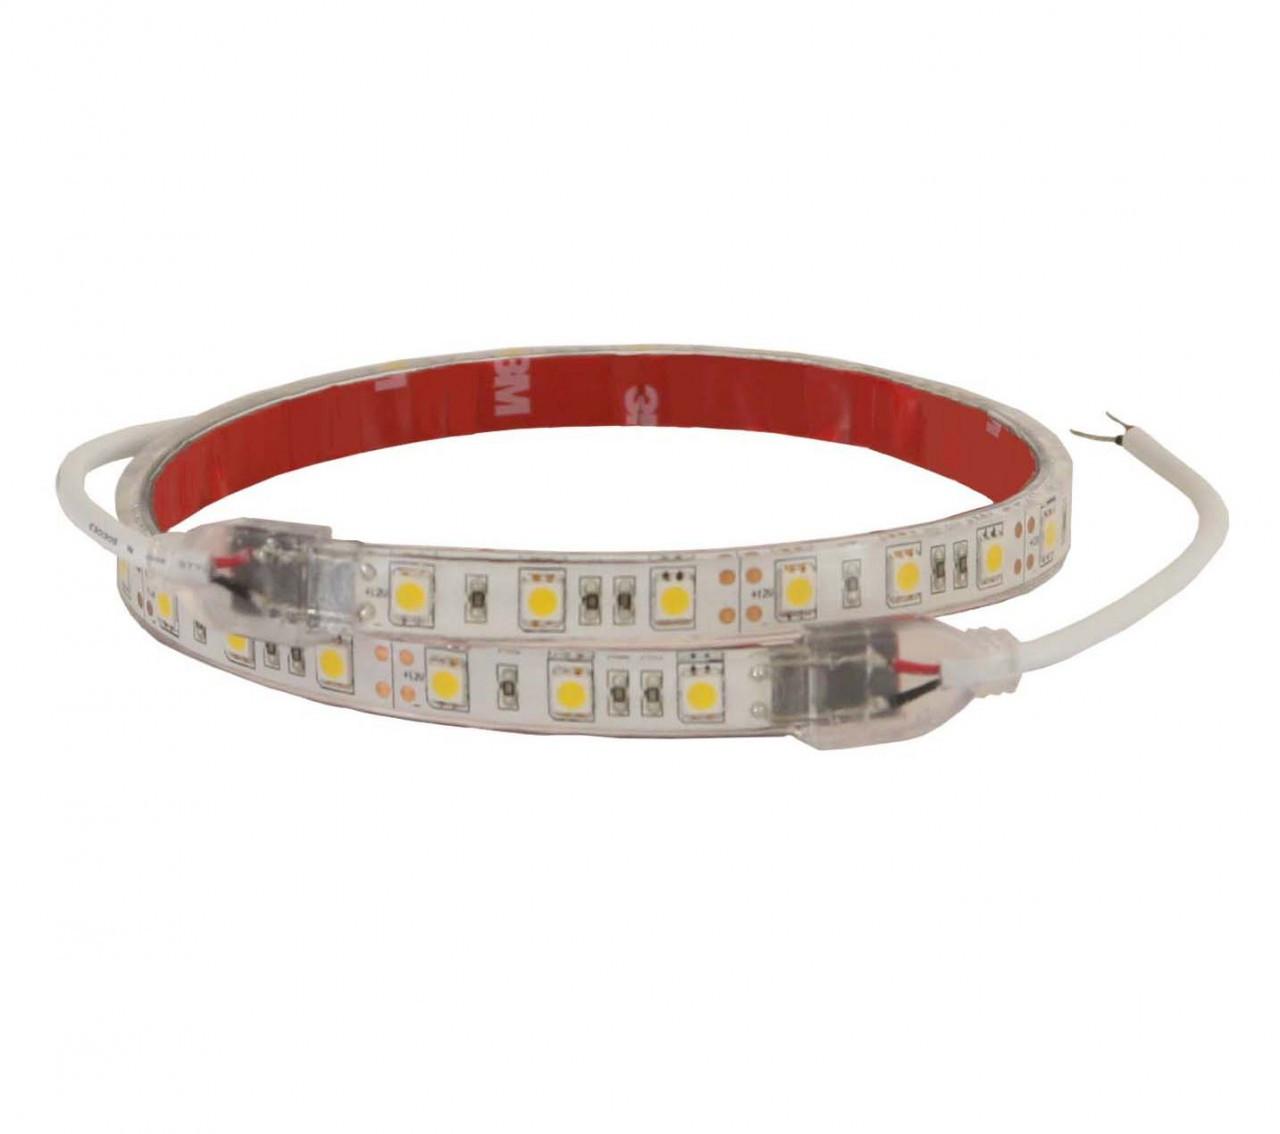 LED24C36 --- LED Light Strip - 36 Clear Diodes